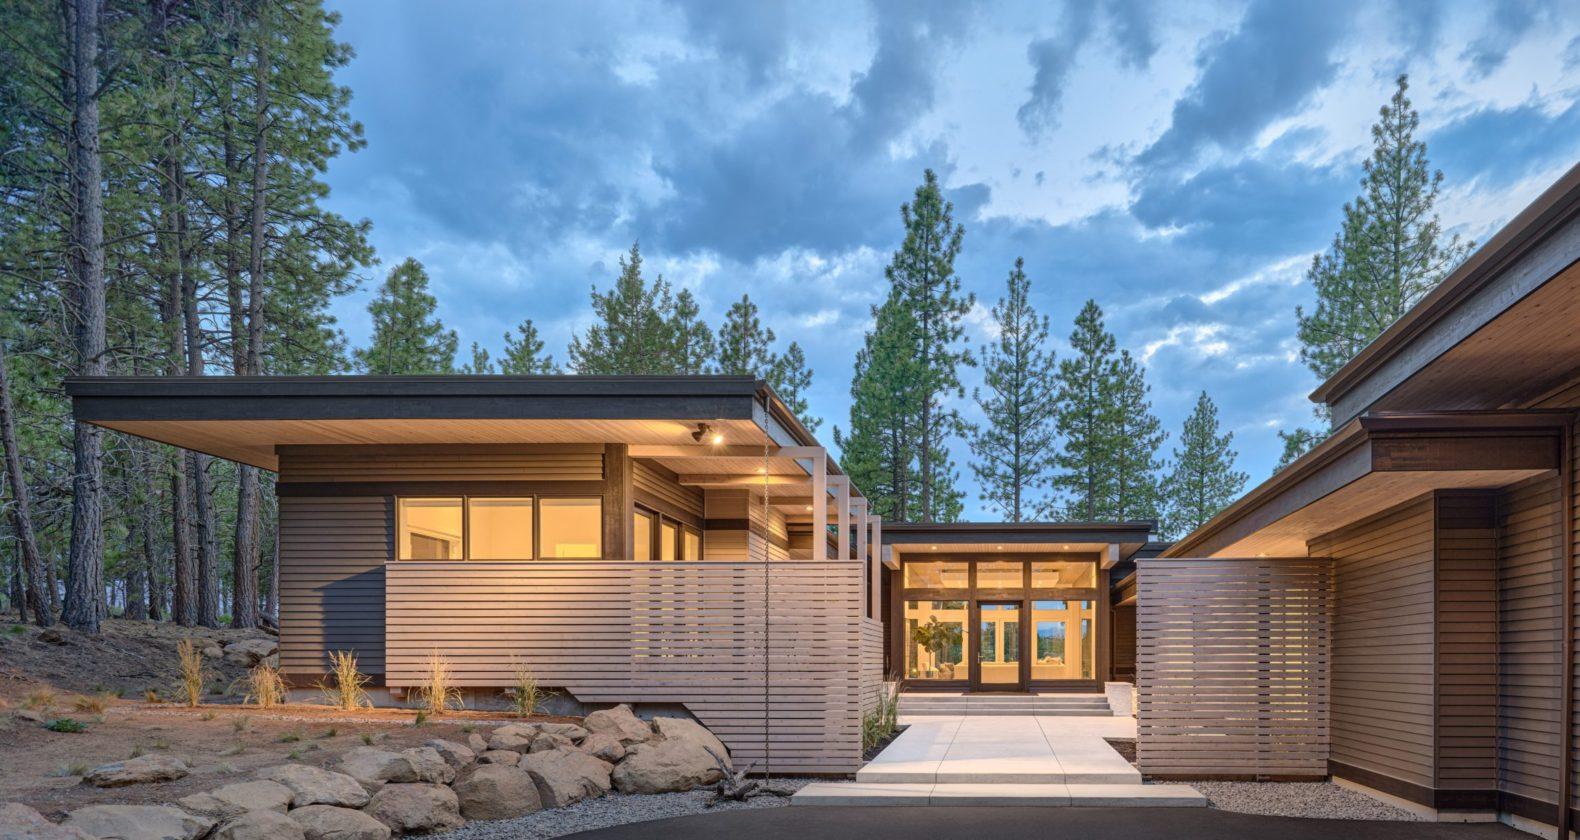 modern architecture bend oregon tetherow golf dream home steel bridge mountain bike outdoor living